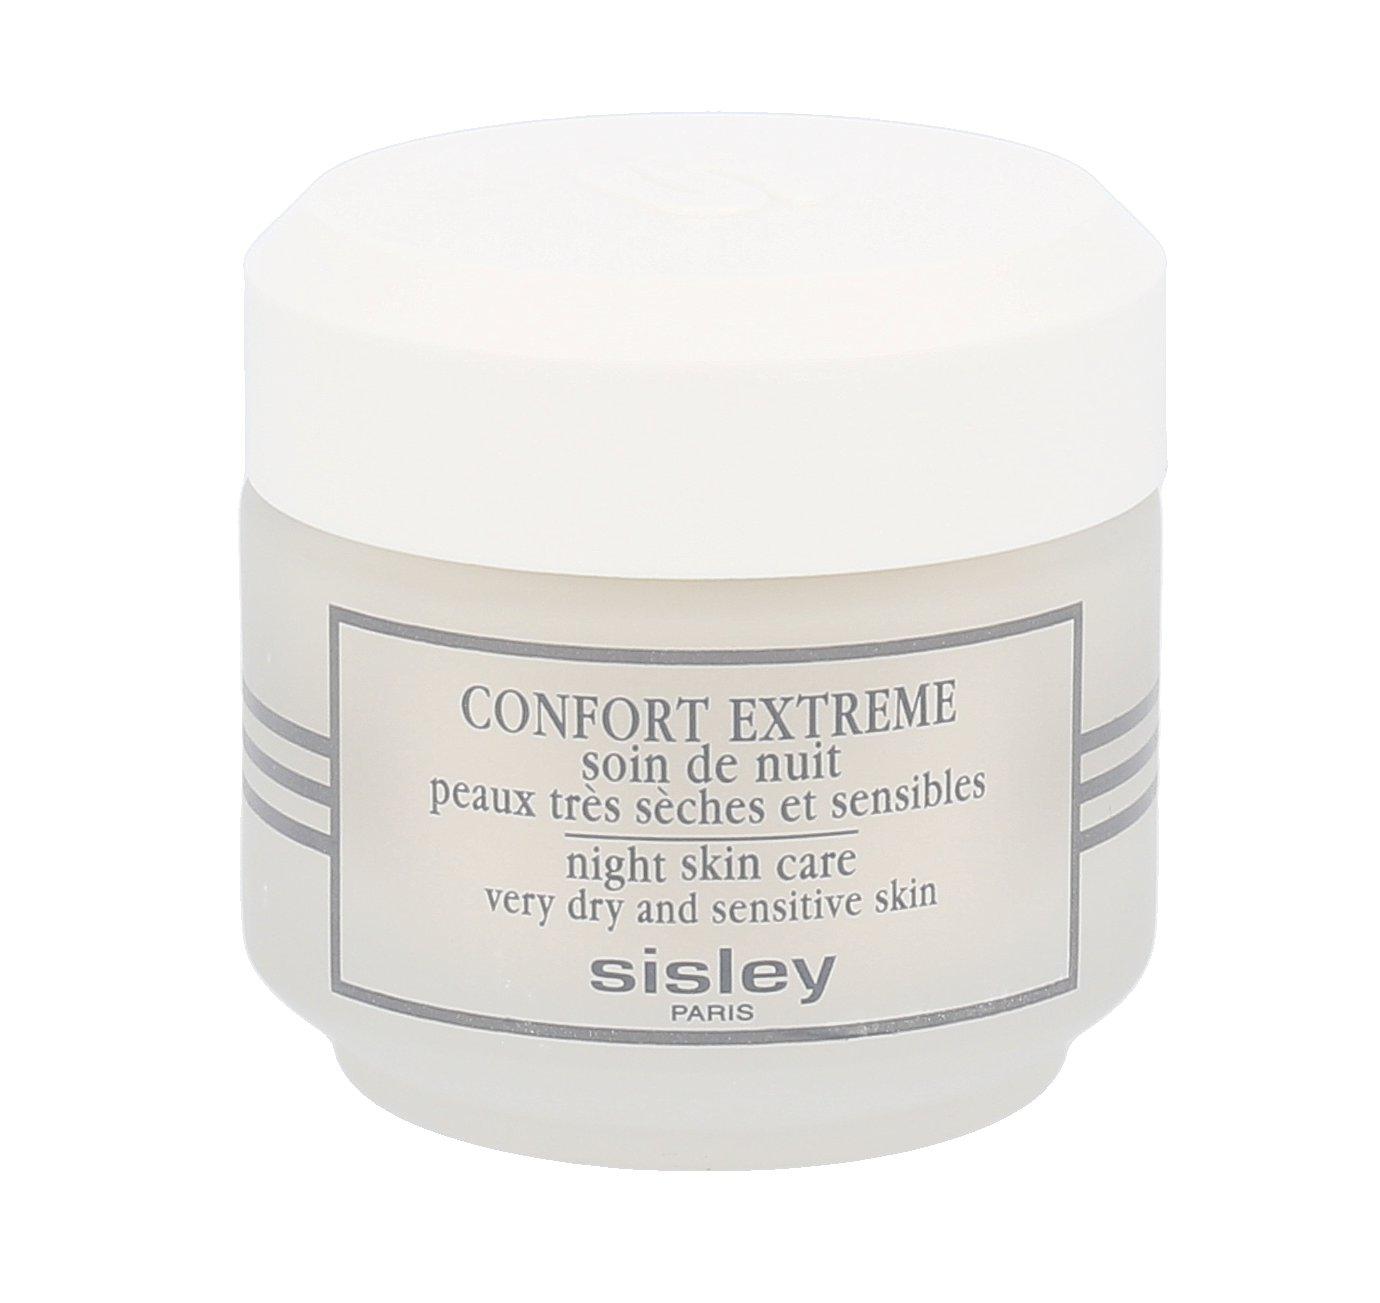 Sisley Confort Extreme Night Skin Care 50 ml